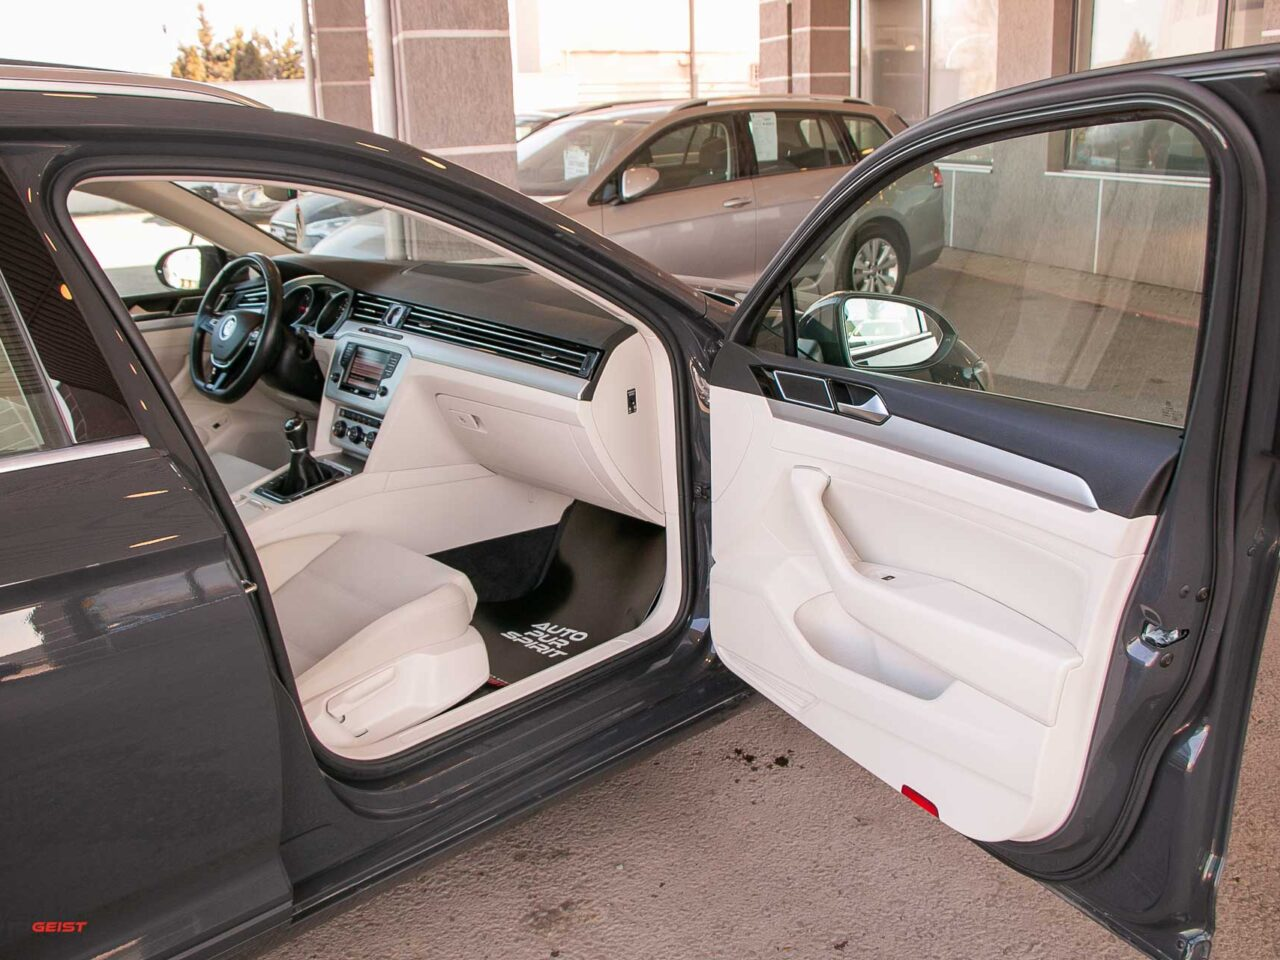 VW-PASSAT-break-panoramic-4526